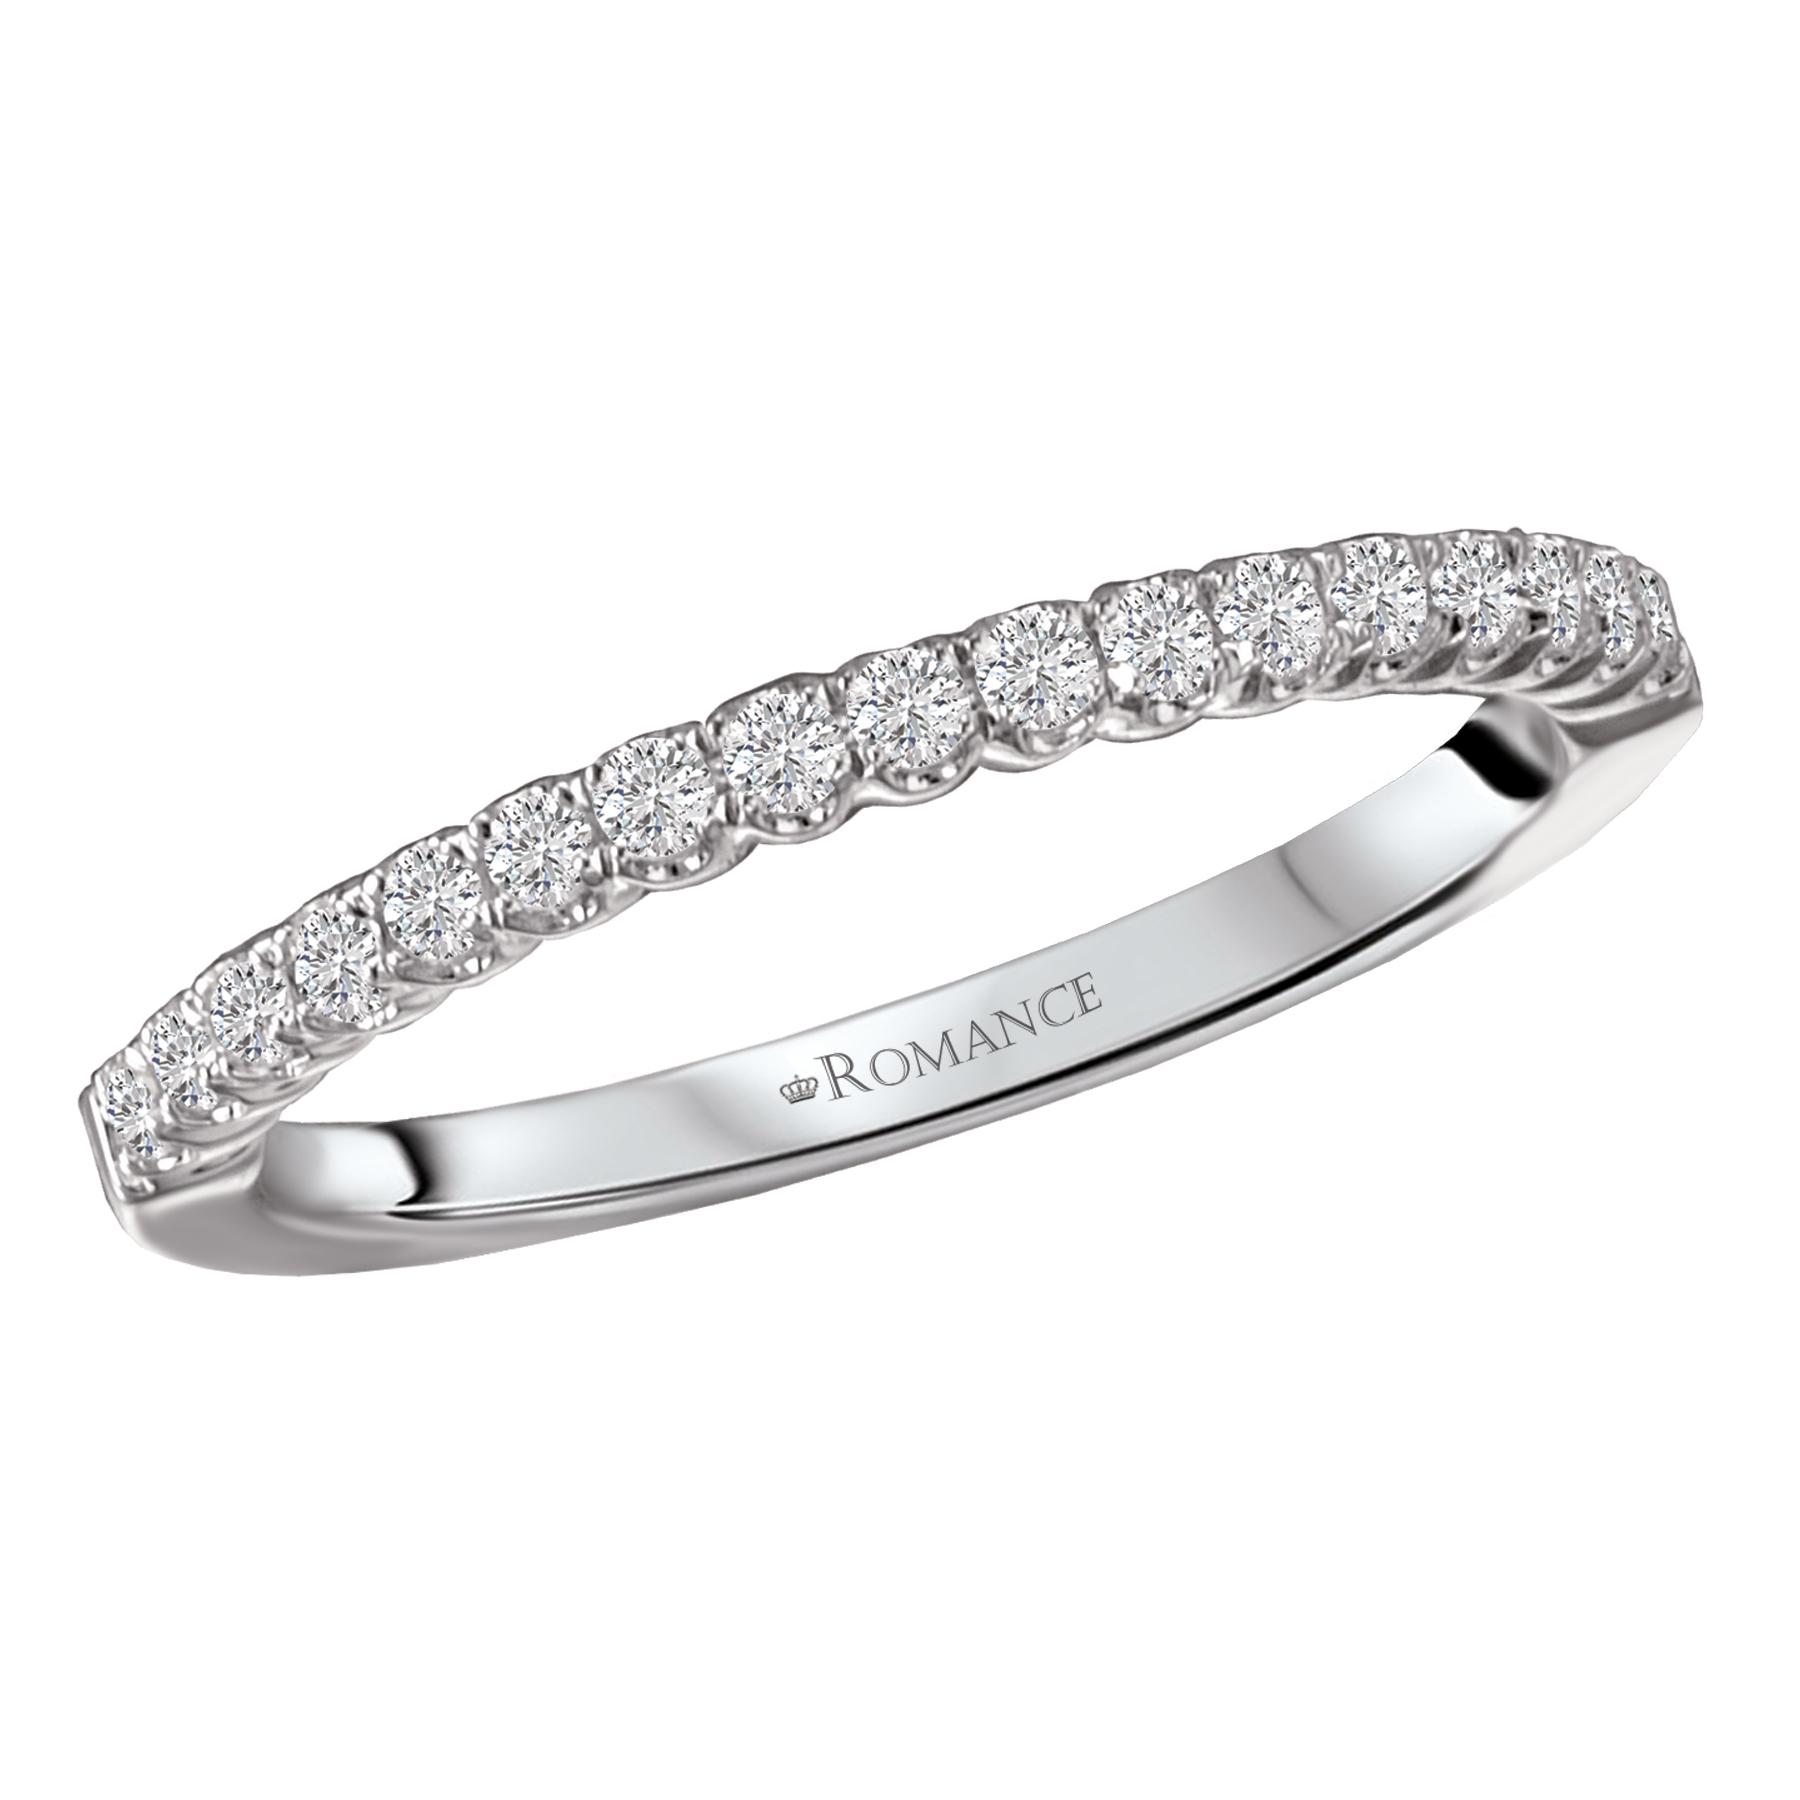 Romance Wedding Bands 117646-W product image